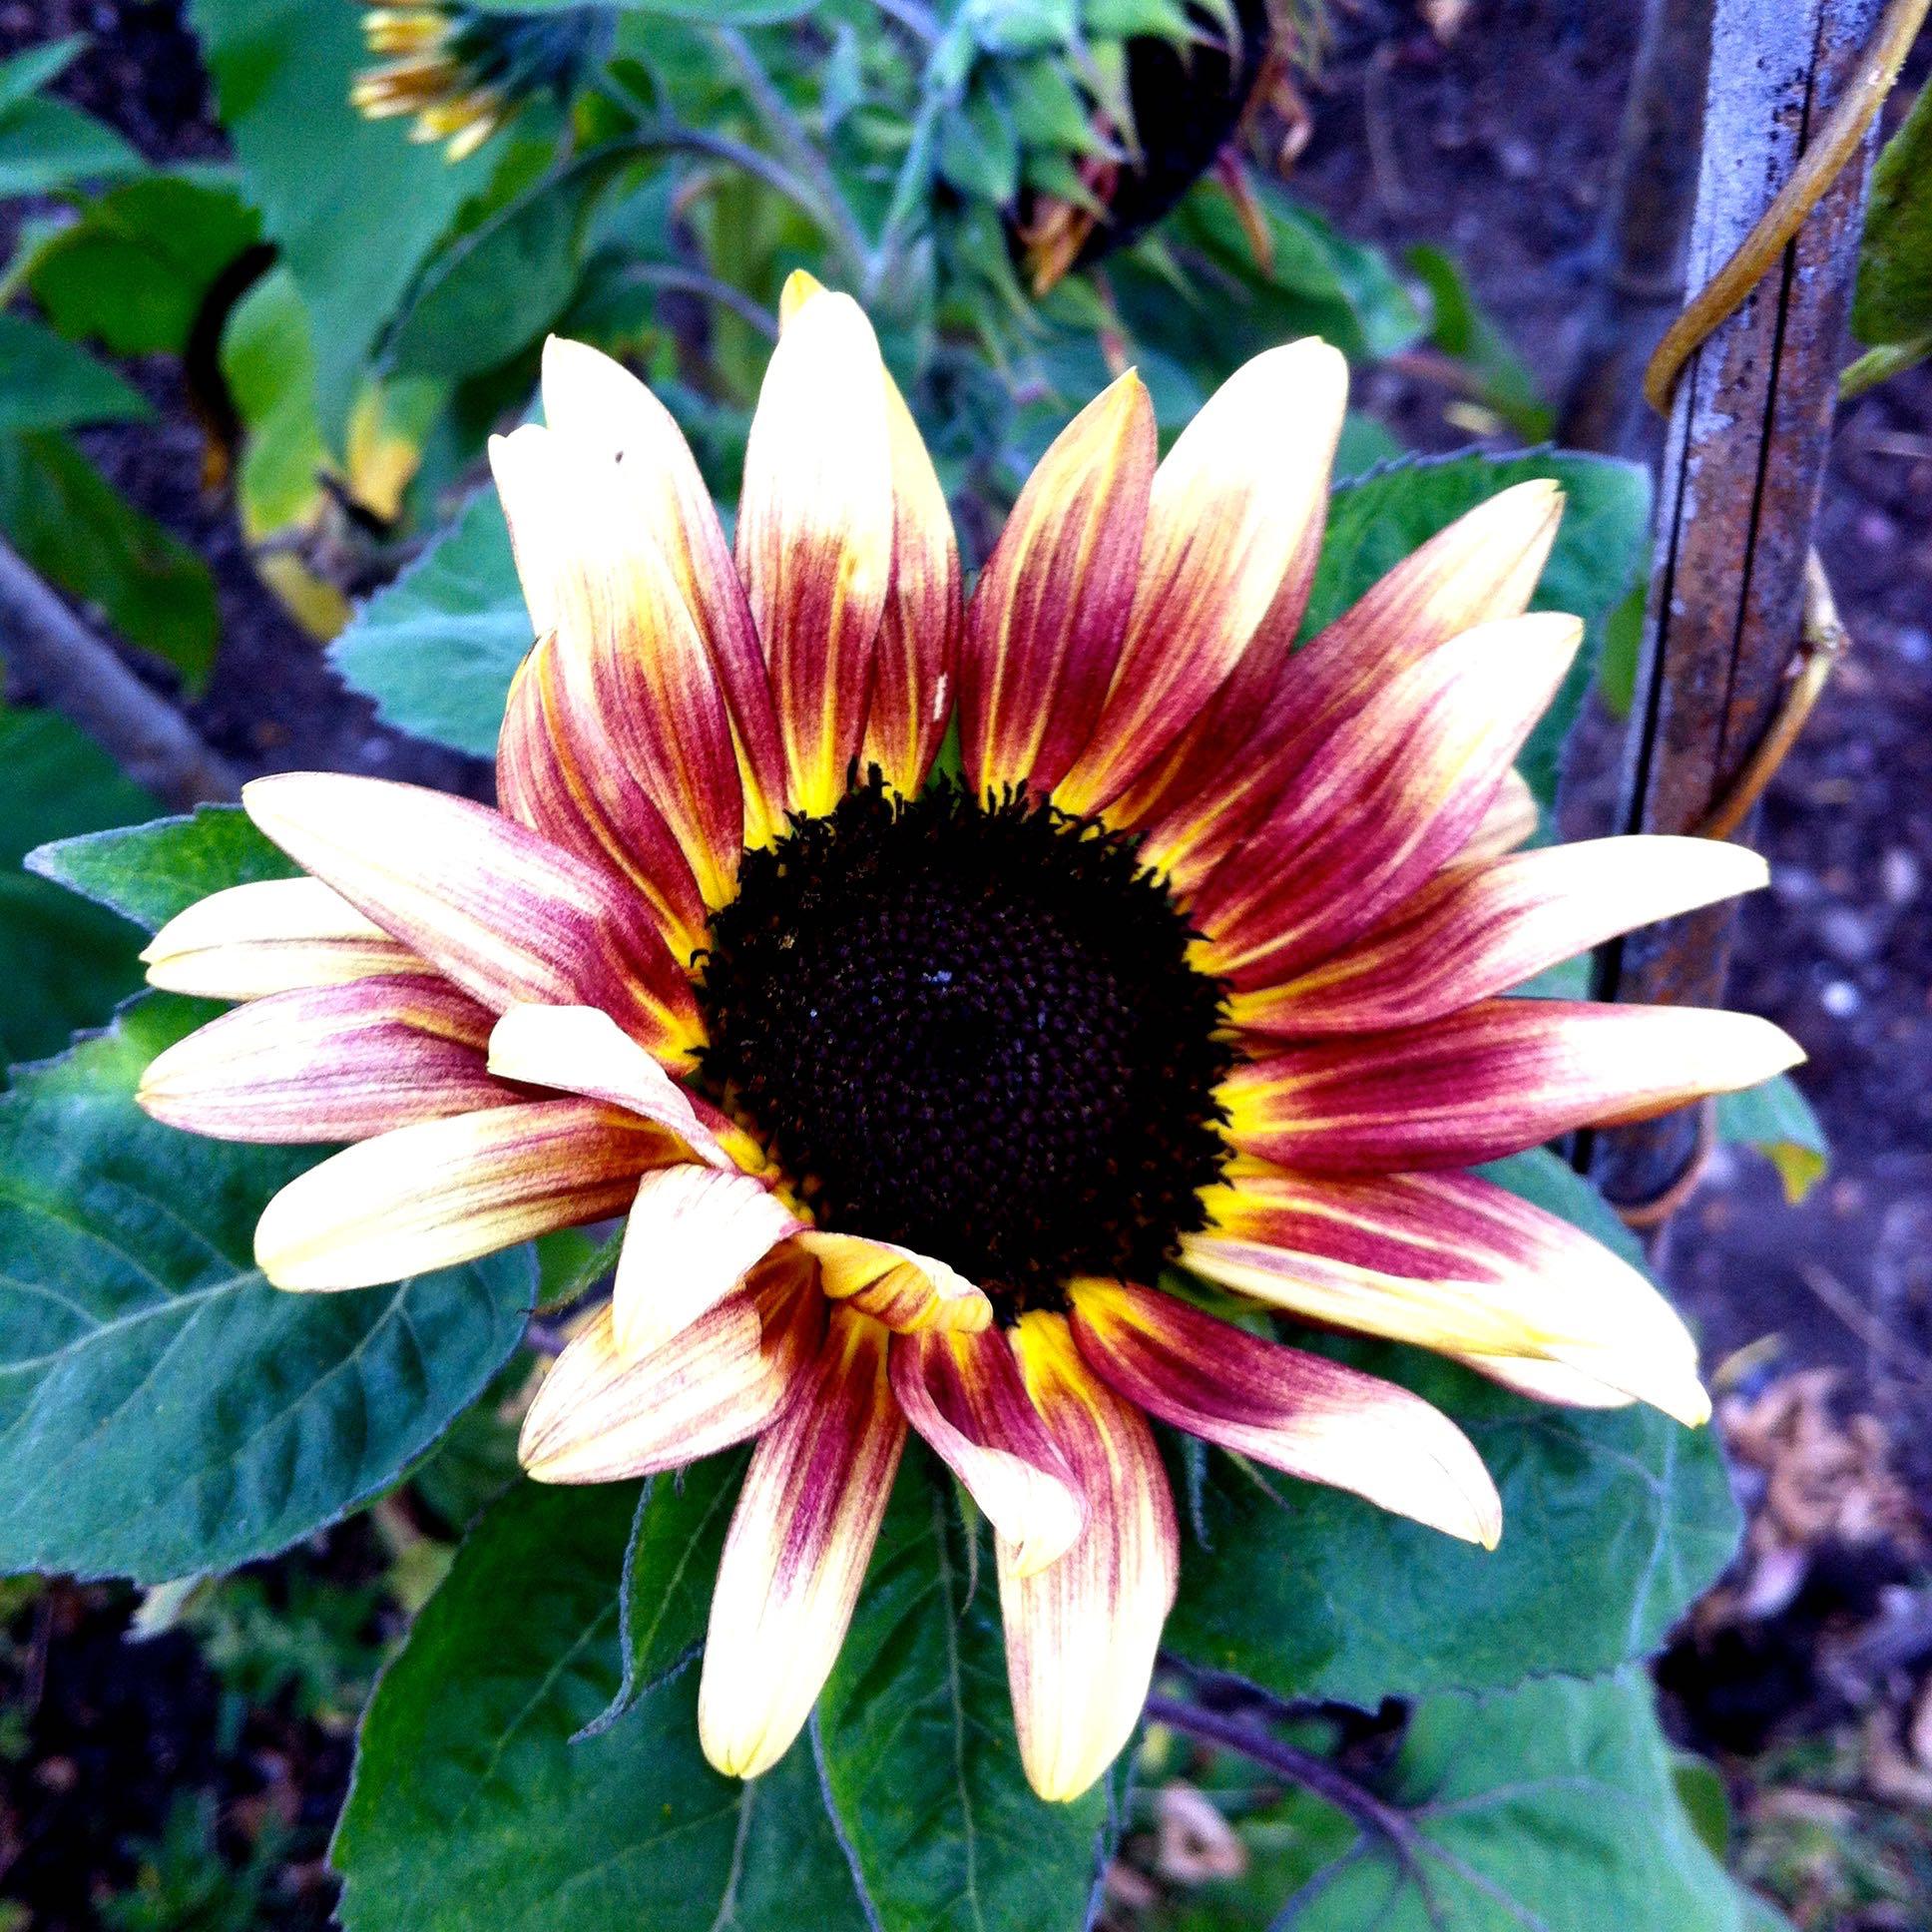 A blushing sunflower